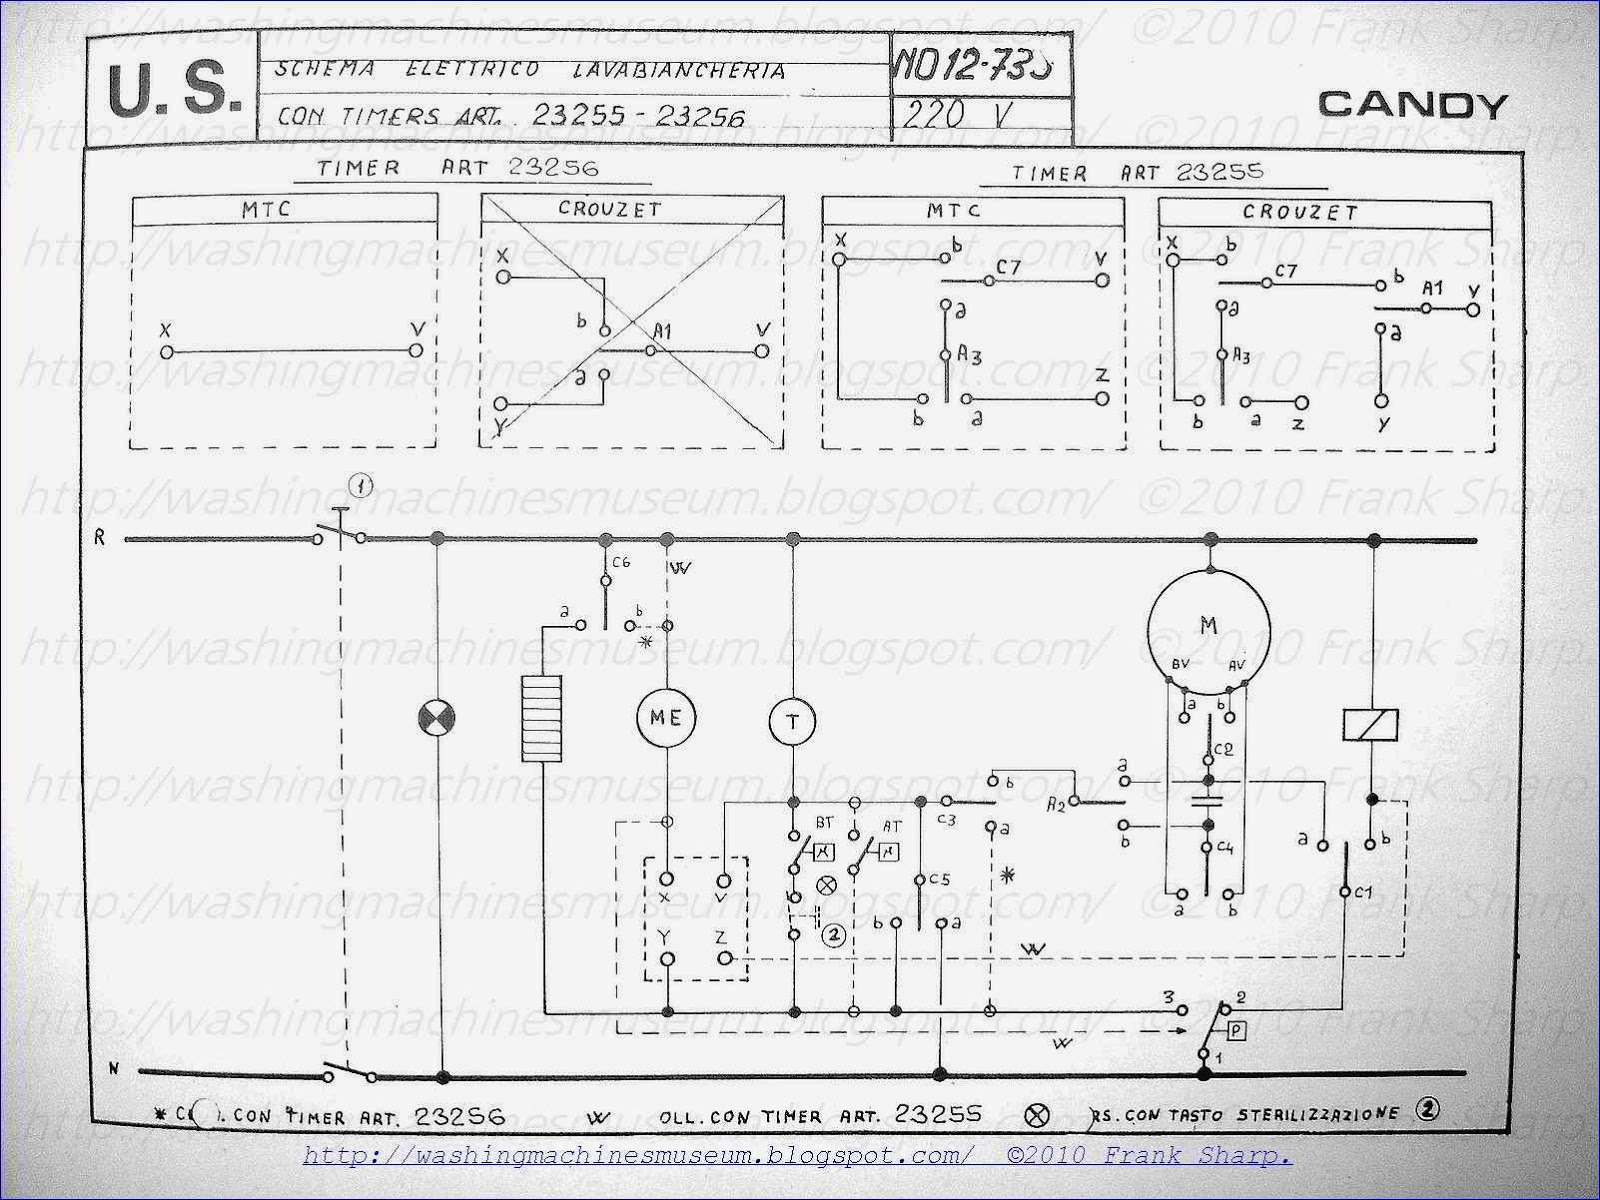 Old Fashioned Maytag Dryer Wiring Diagram Mdg6700aww Frieze ...